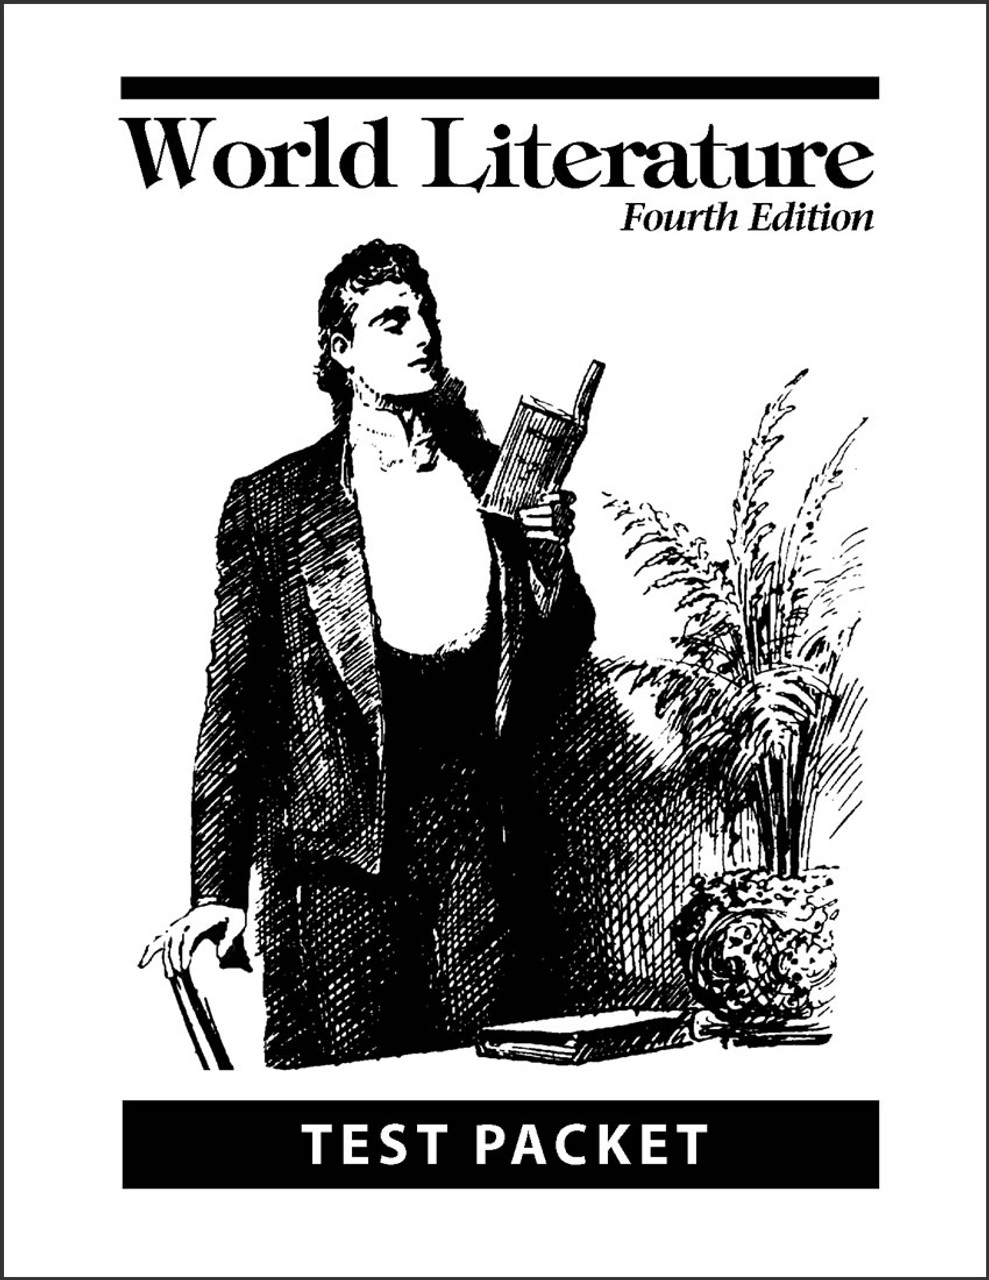 World Literature, 4th edition - Test Packet